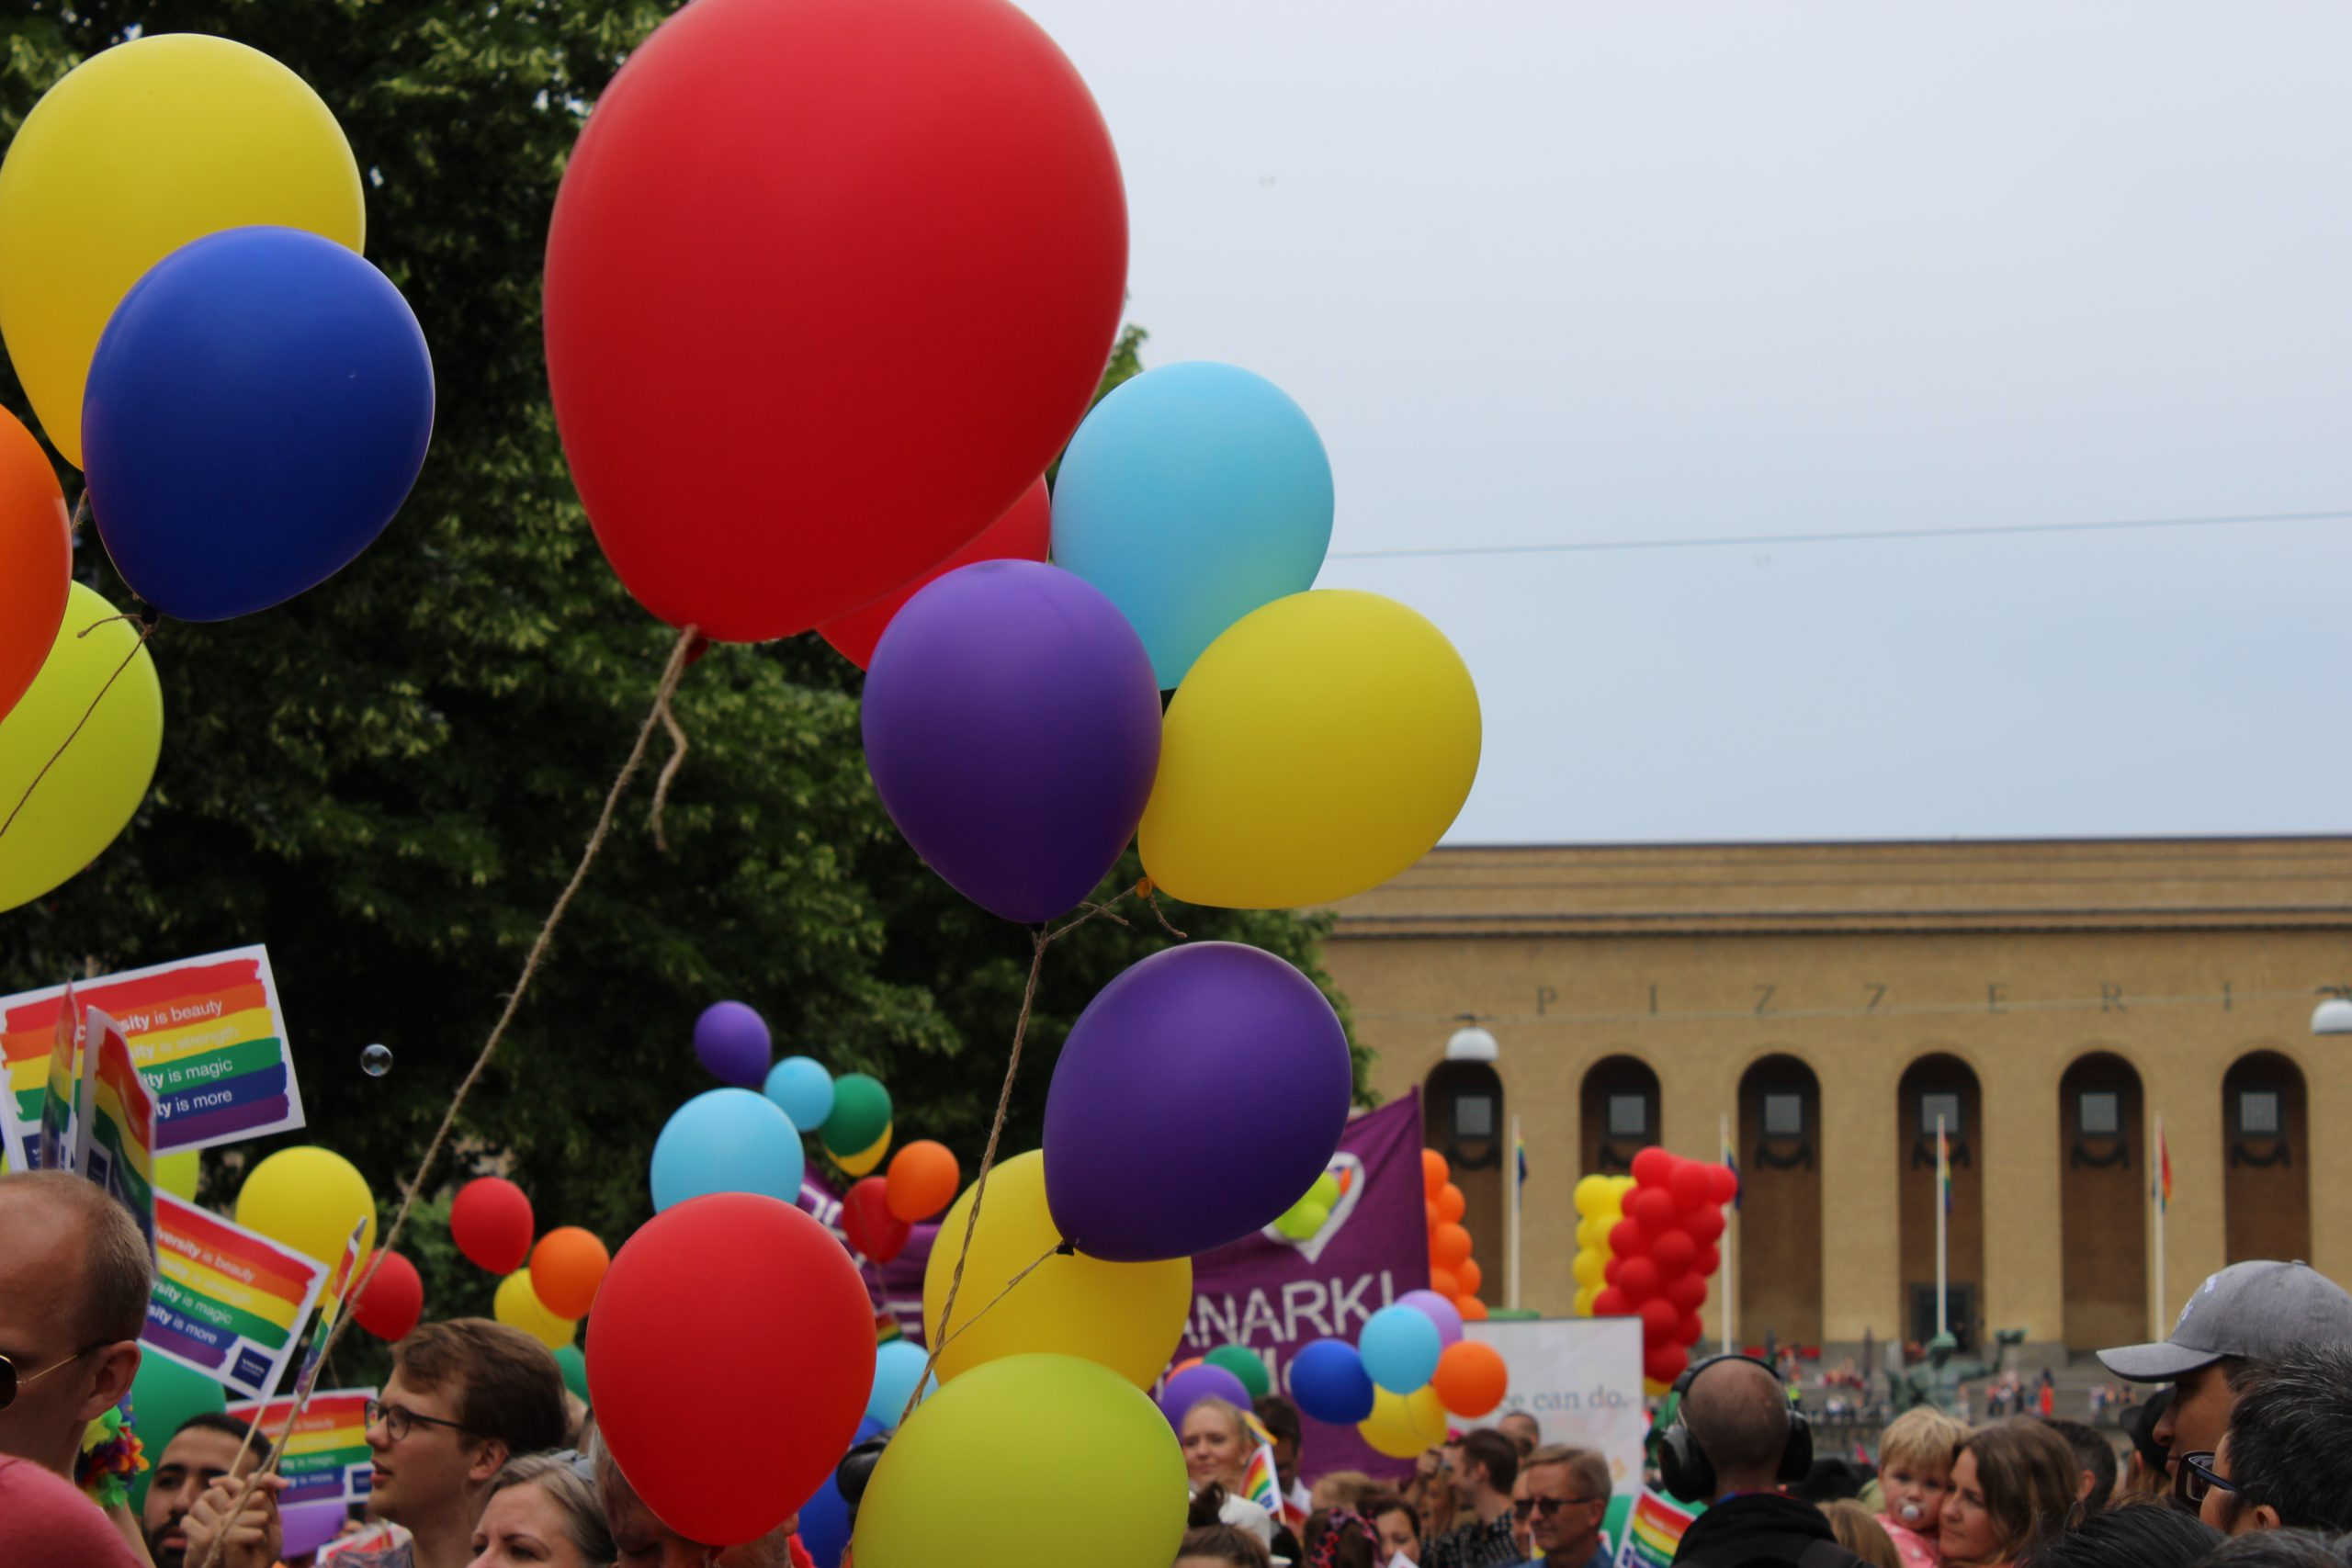 färgglada ballonger med Göteborgs konstmuseum i bakgrunden